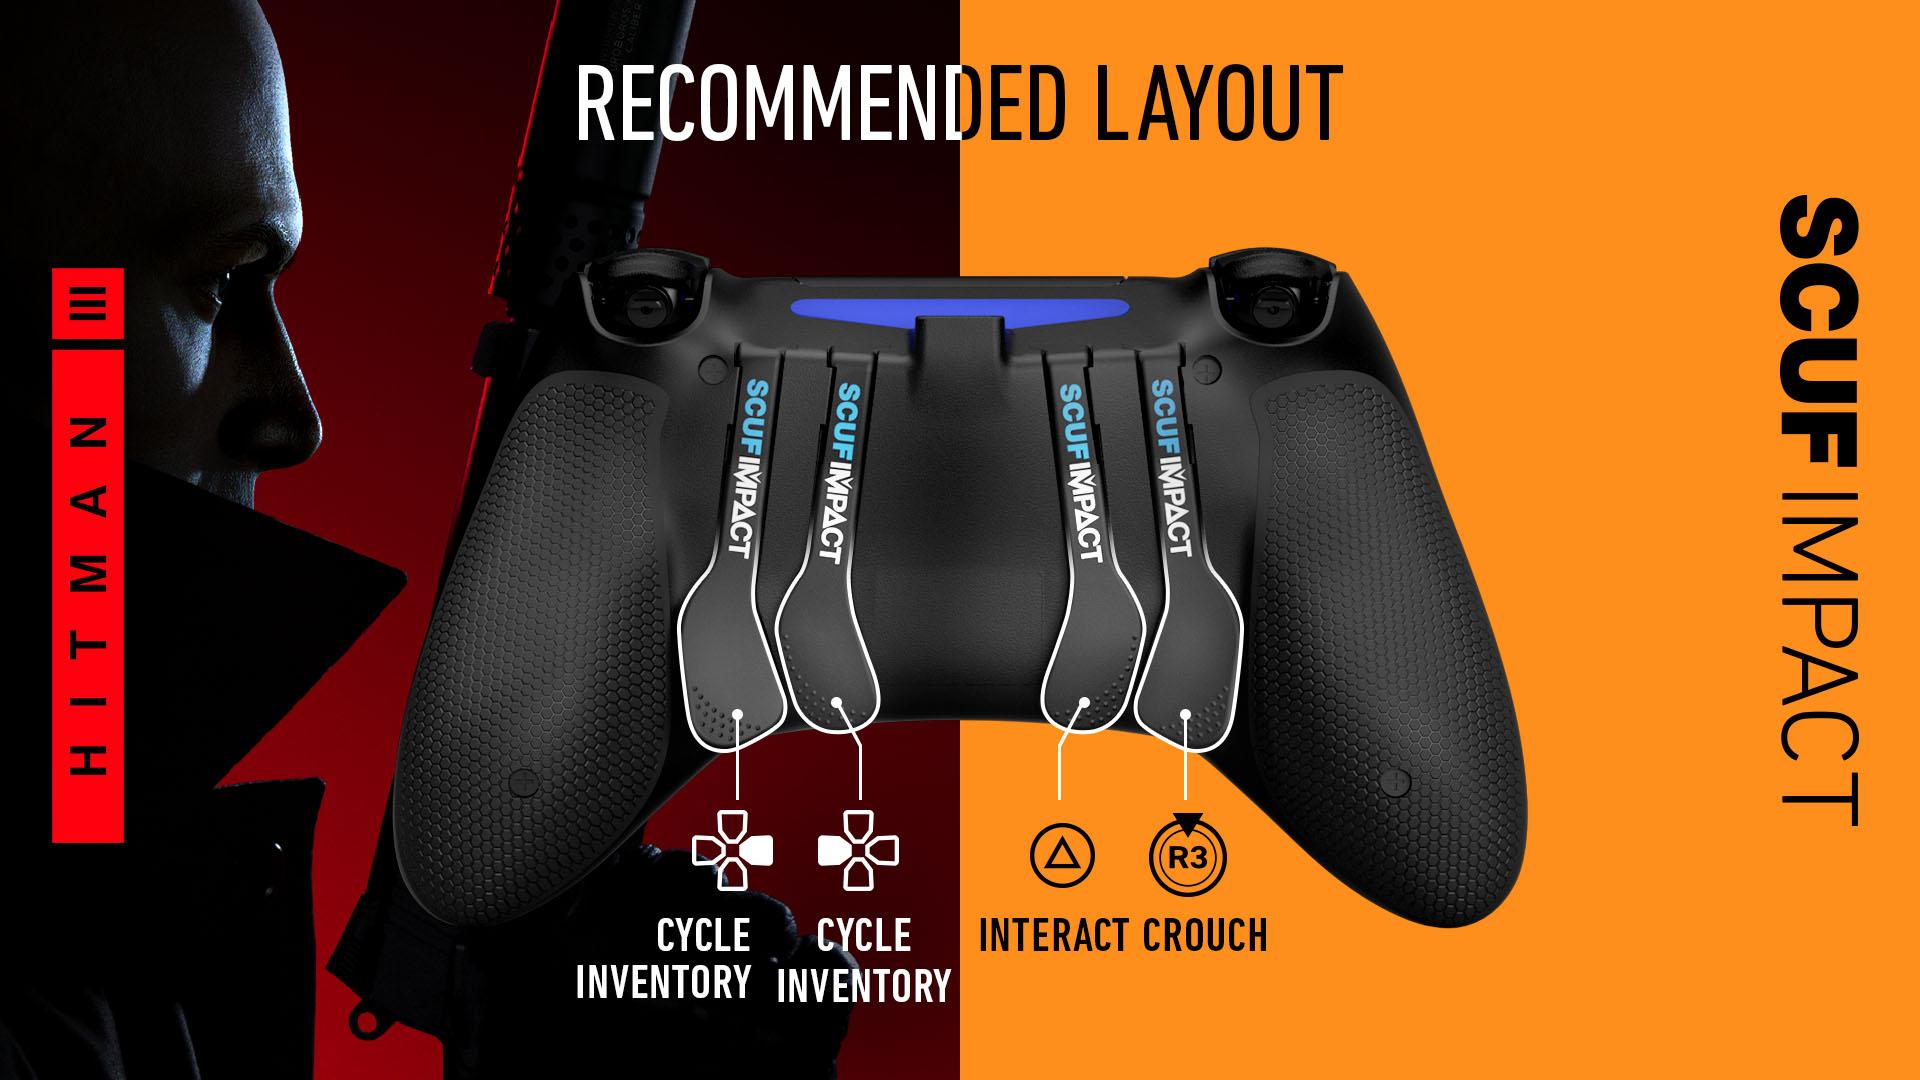 Hitman 3 PS4 Controller Set Up SCUF IMPACT